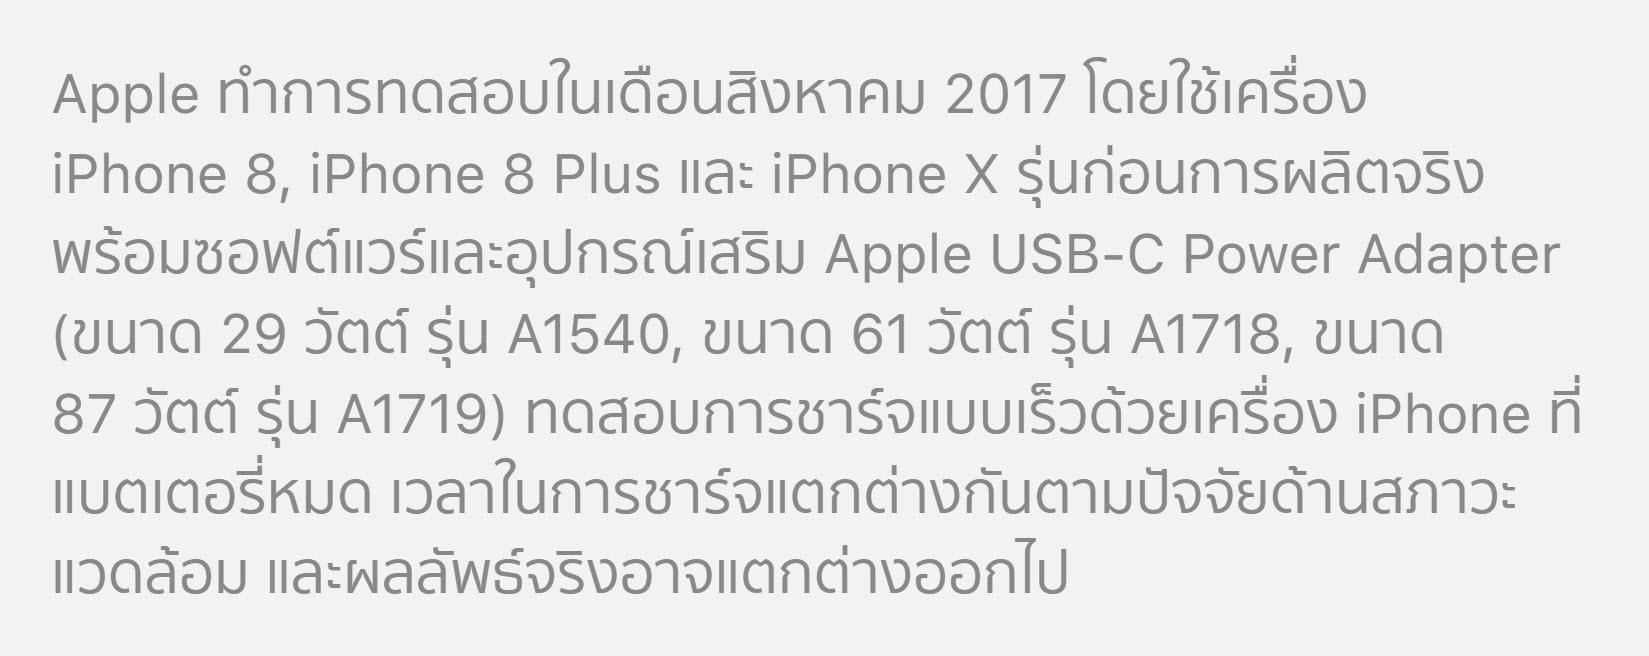 Iphone8 Iphonex Fastcharge 2